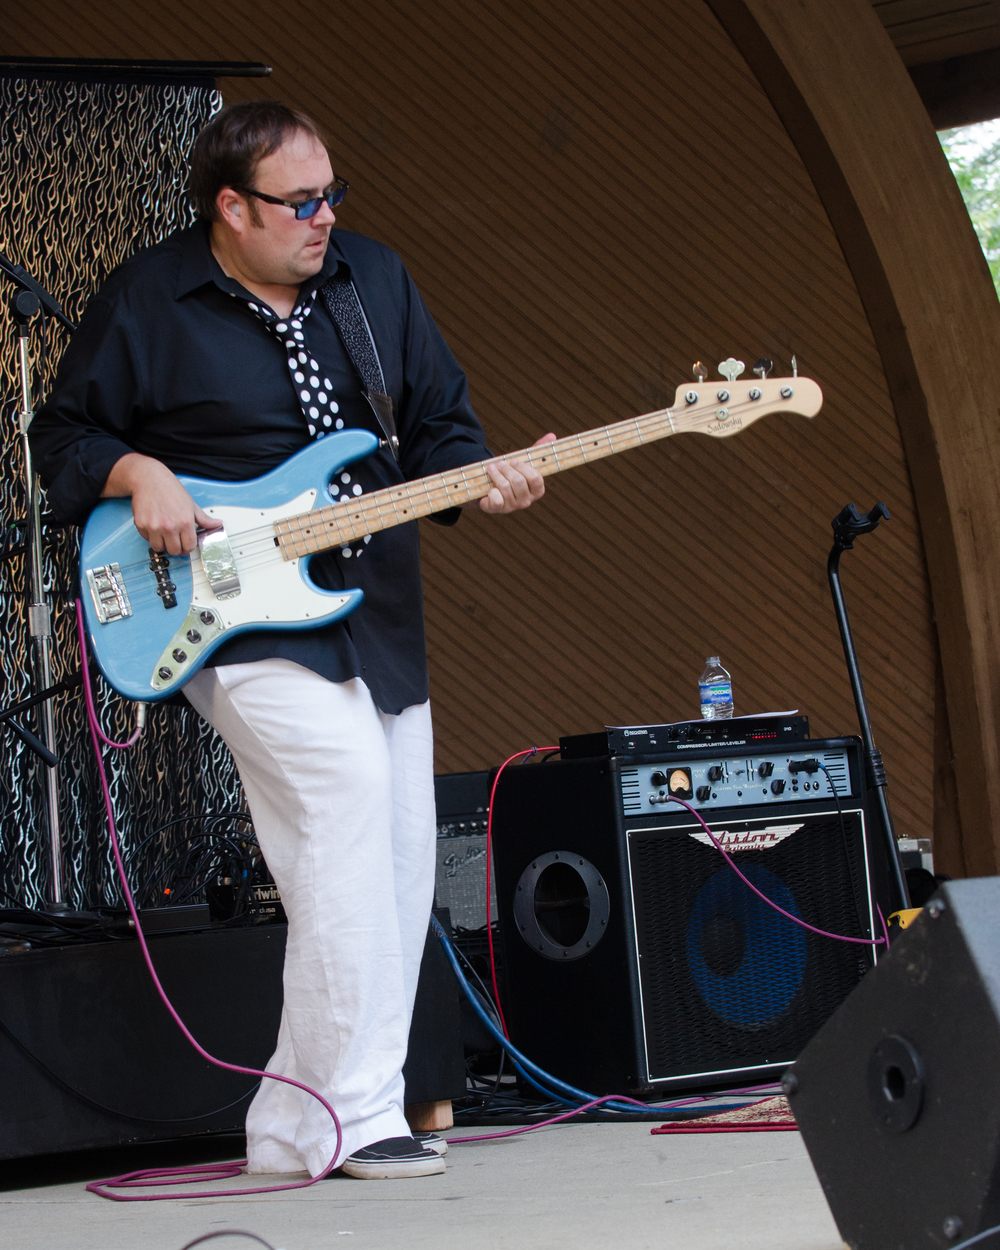 Fleetwood_Blues_Festival_2013-08-11_-313.jpg